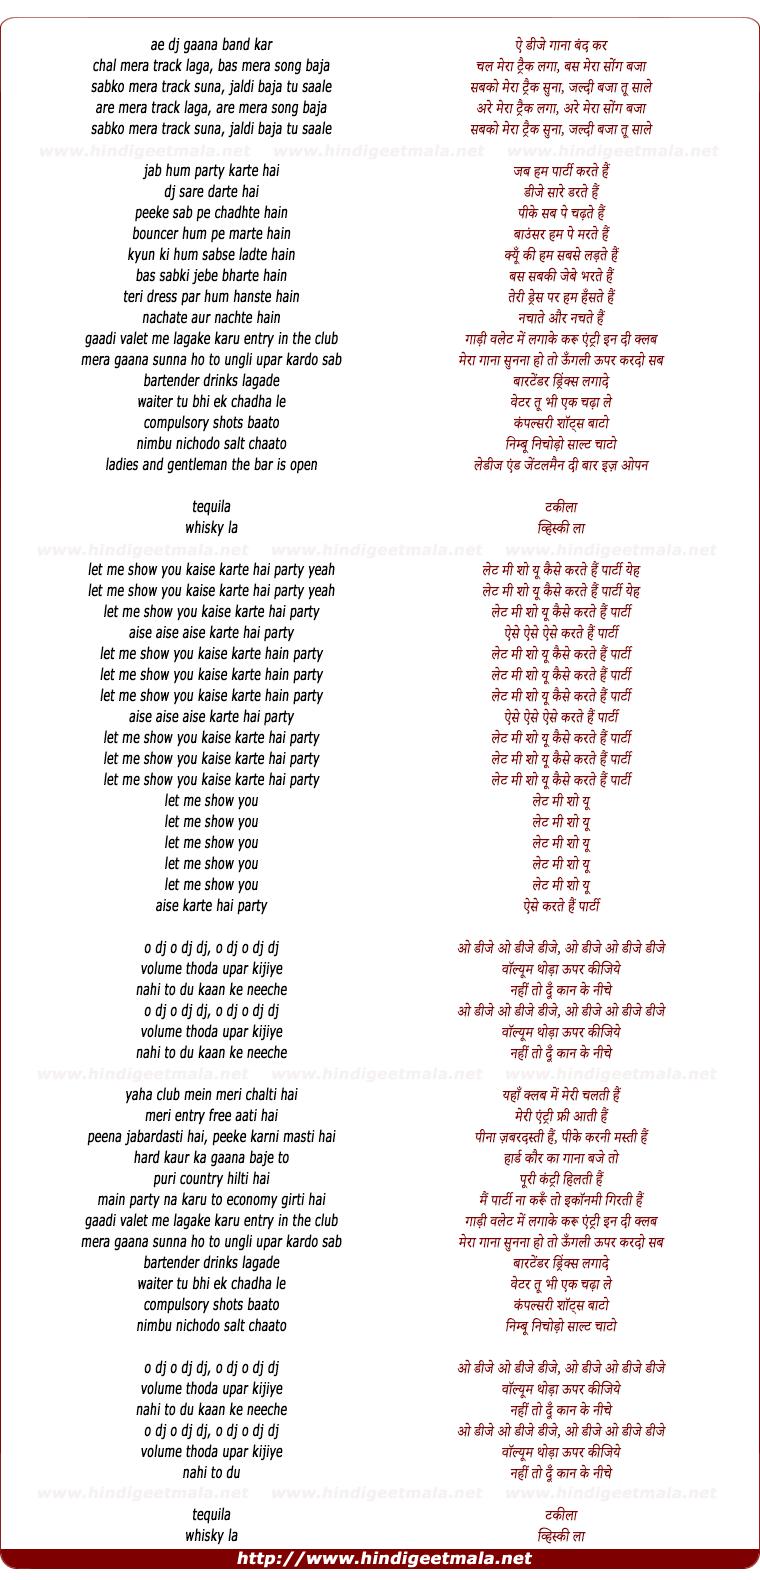 lyrics of song Aise Karte Hai Party